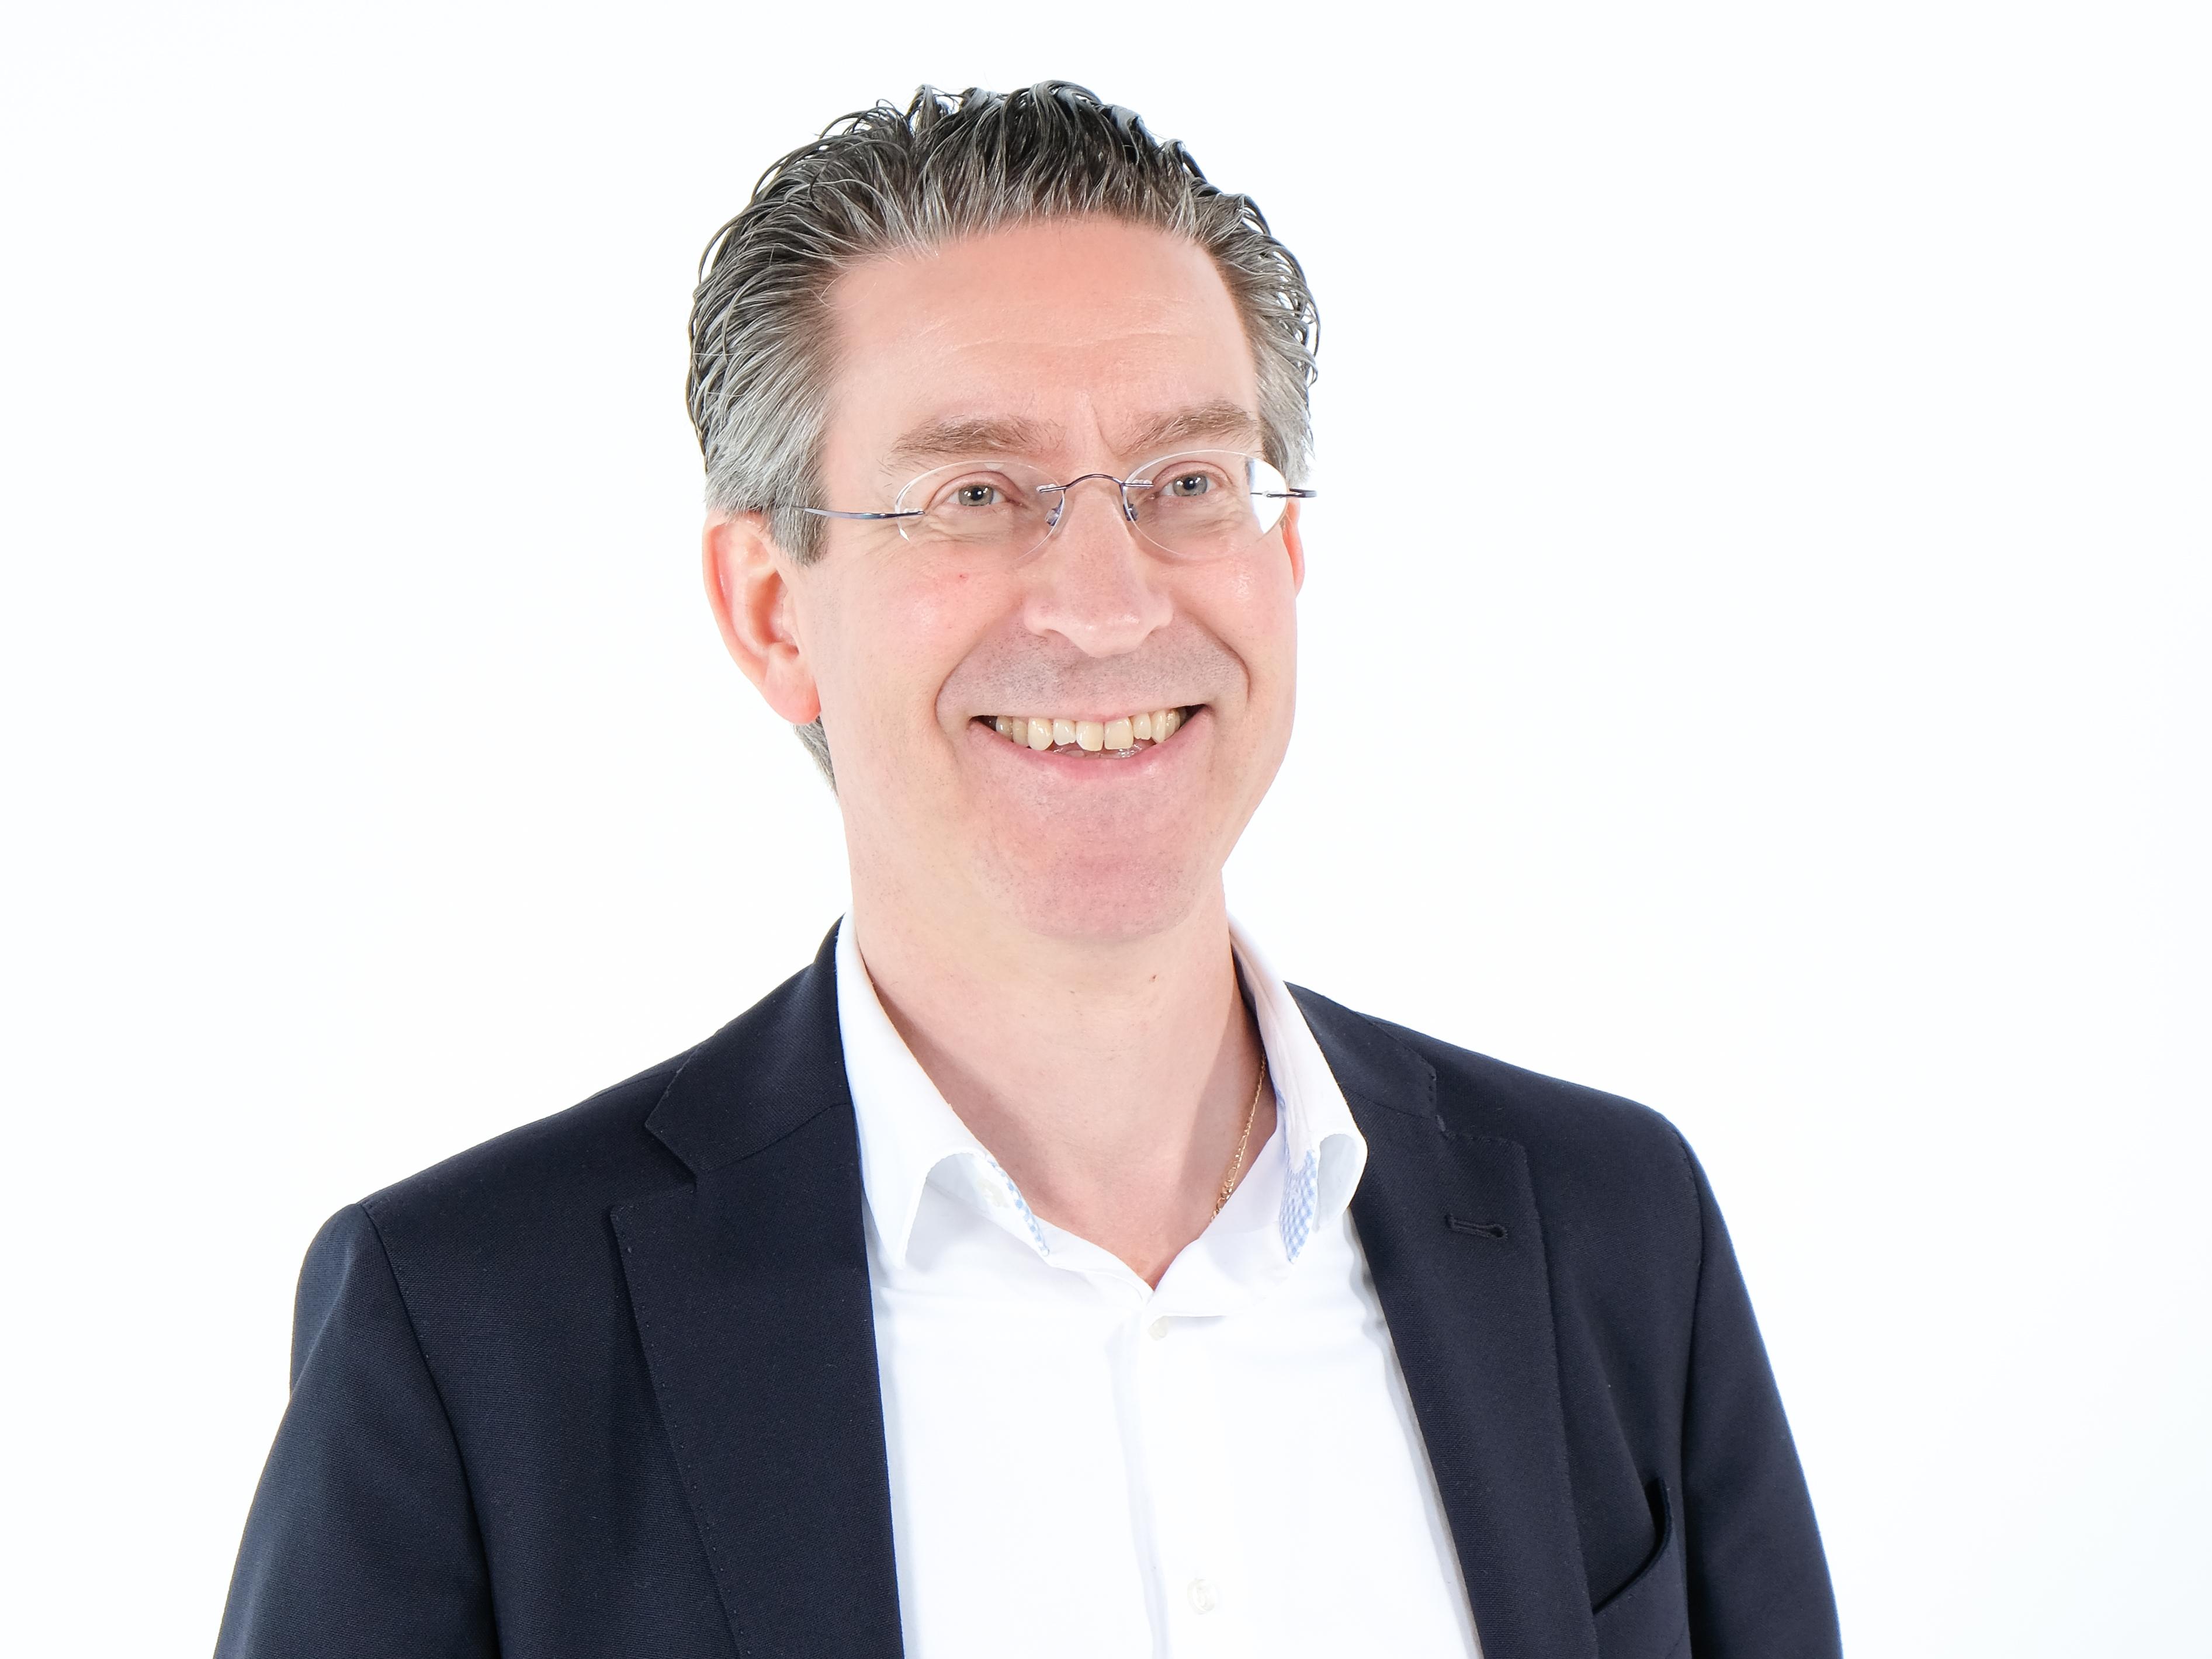 Profielfoto Sander van de Molen